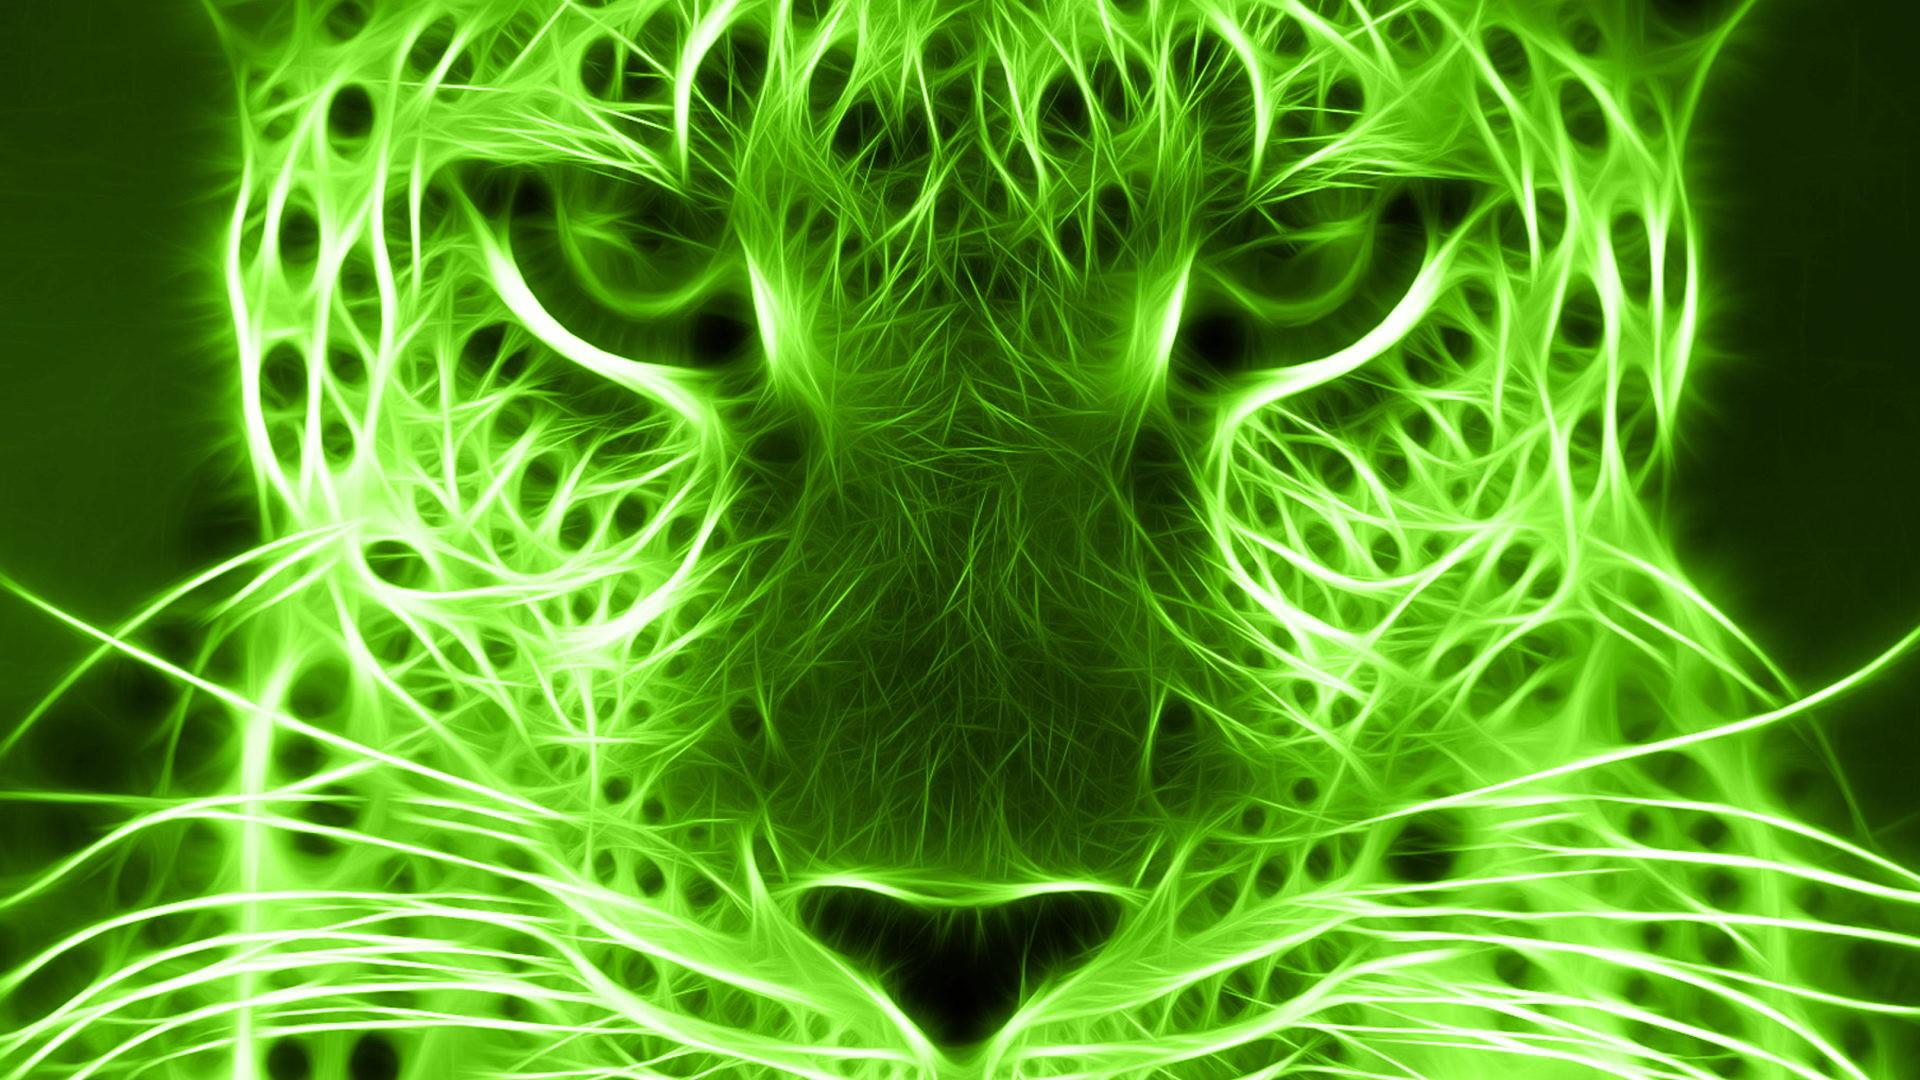 PC Green Wallpaper, ZyzixuN